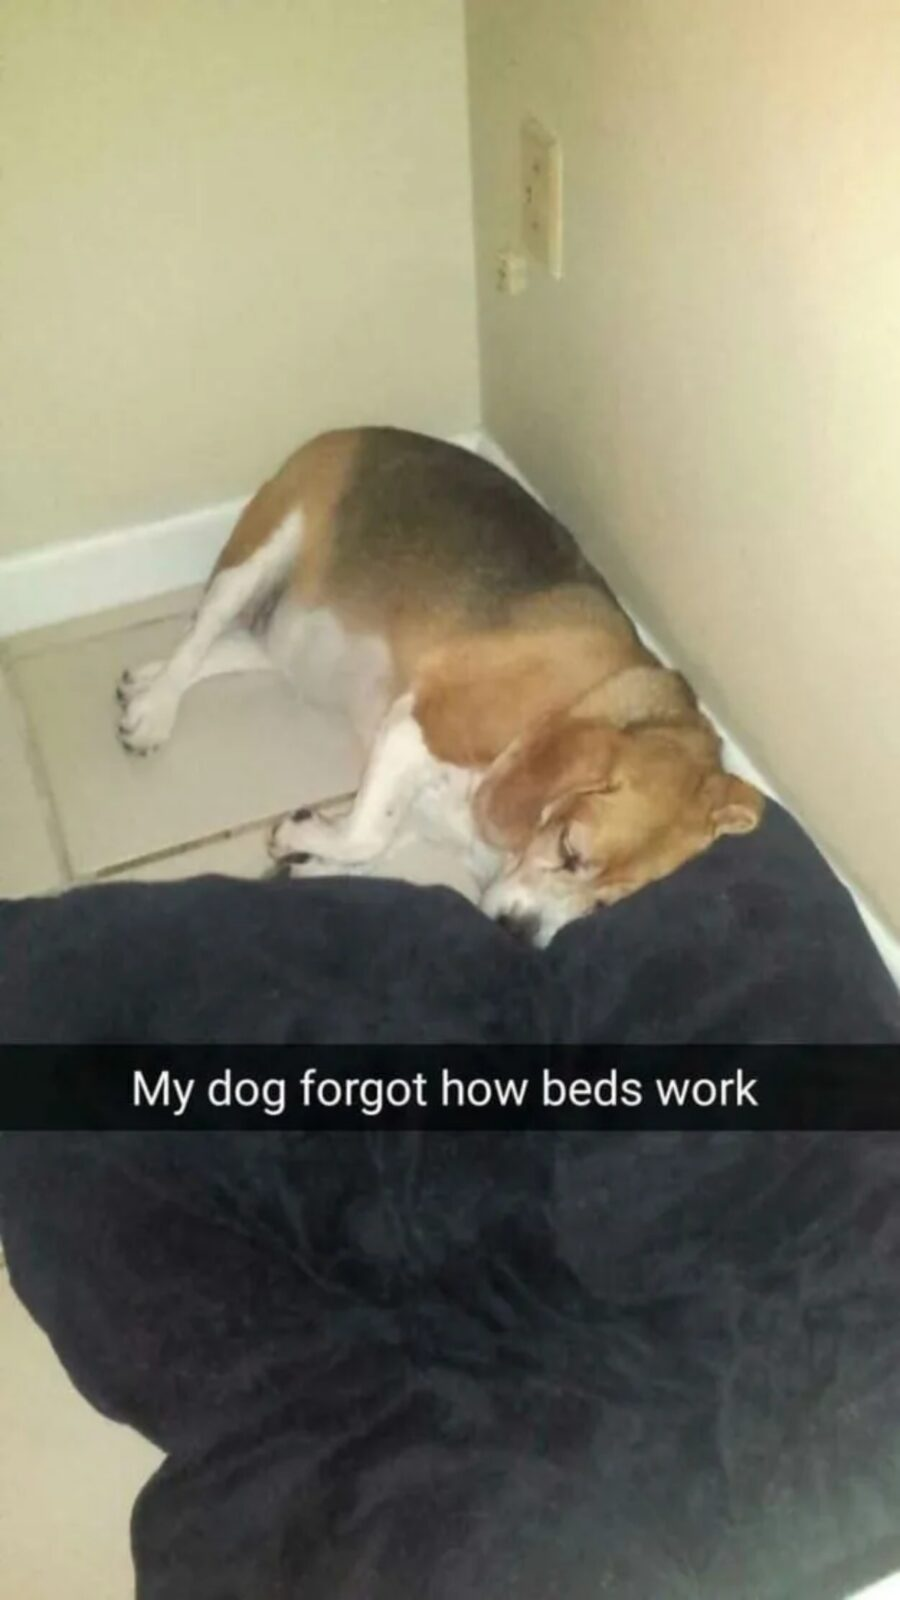 cane fuori cuccia